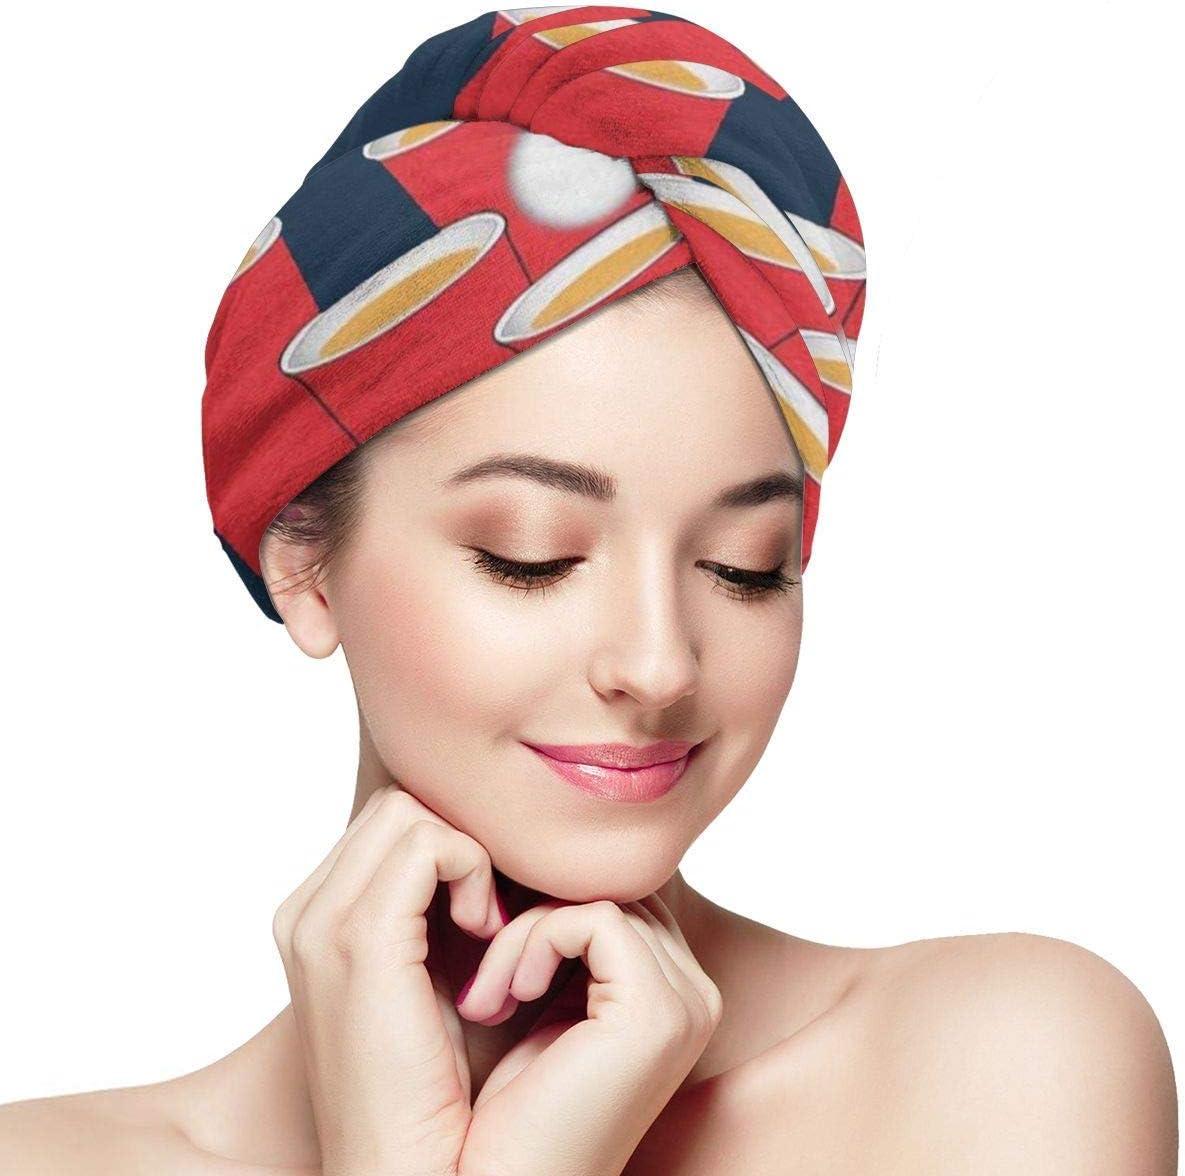 QHMY Pong Microfibra Toalla para el cabello Wraps Secado rápido Cabeza mágica Turbante Sombrero Gorros de ducha 28 x 11 pulgadas